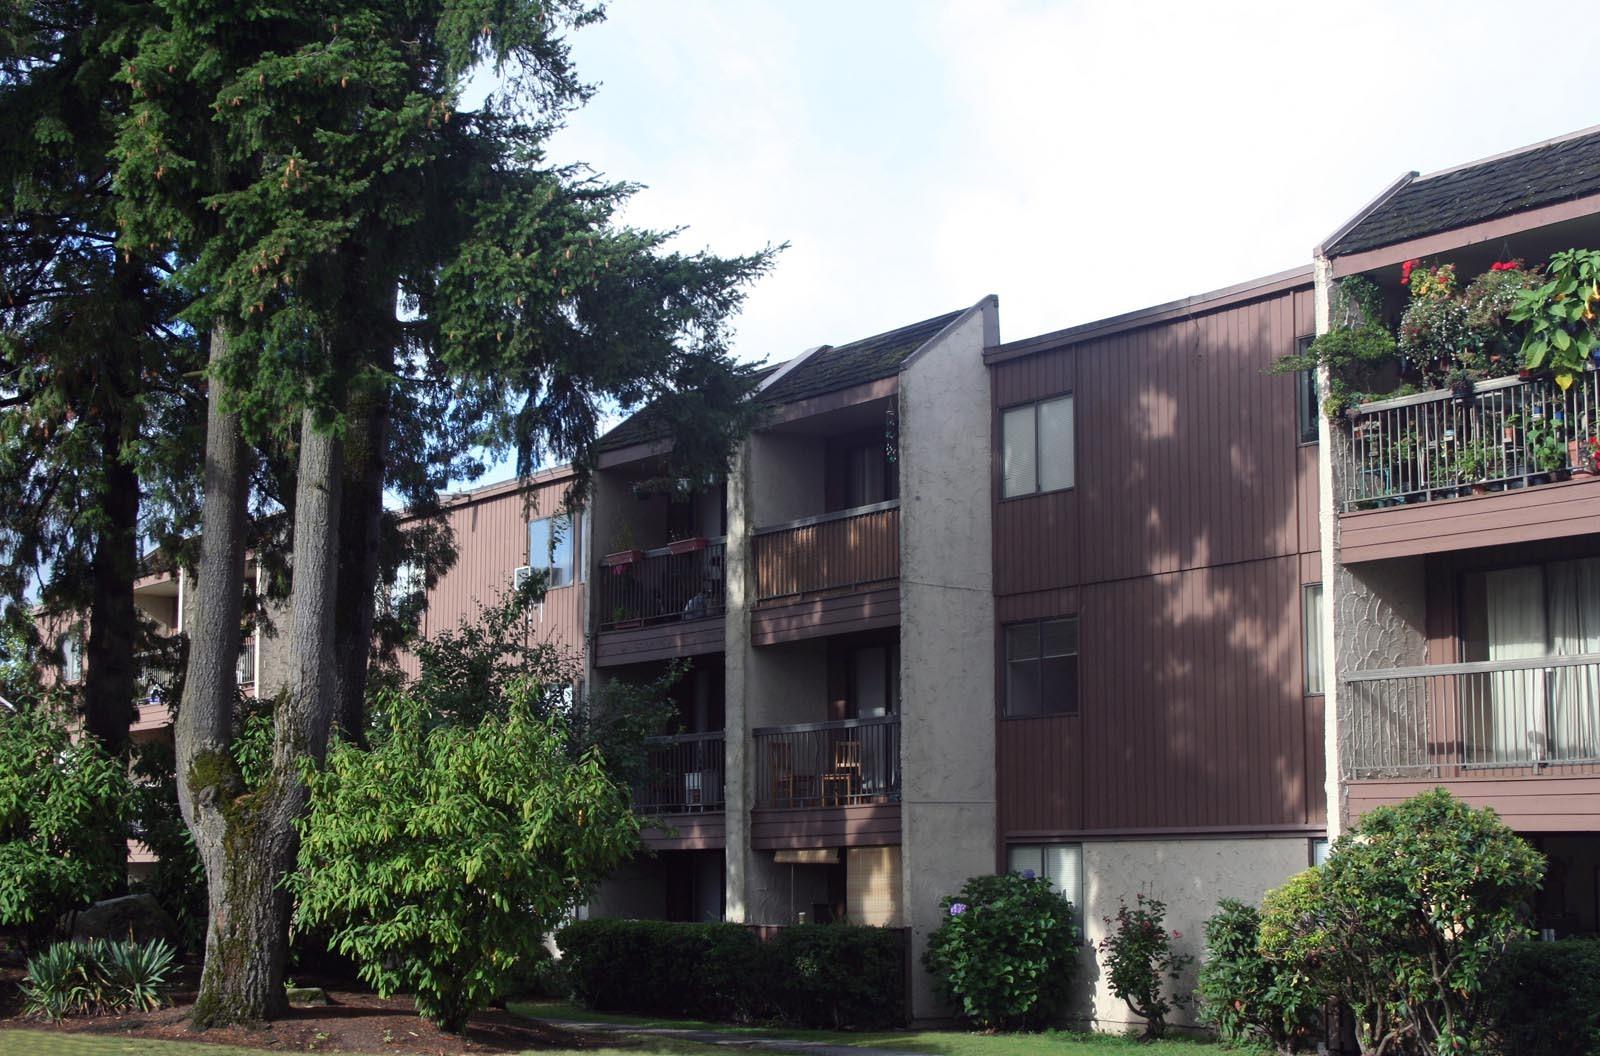 9555 128 Street, Surrey, BC - $1,250